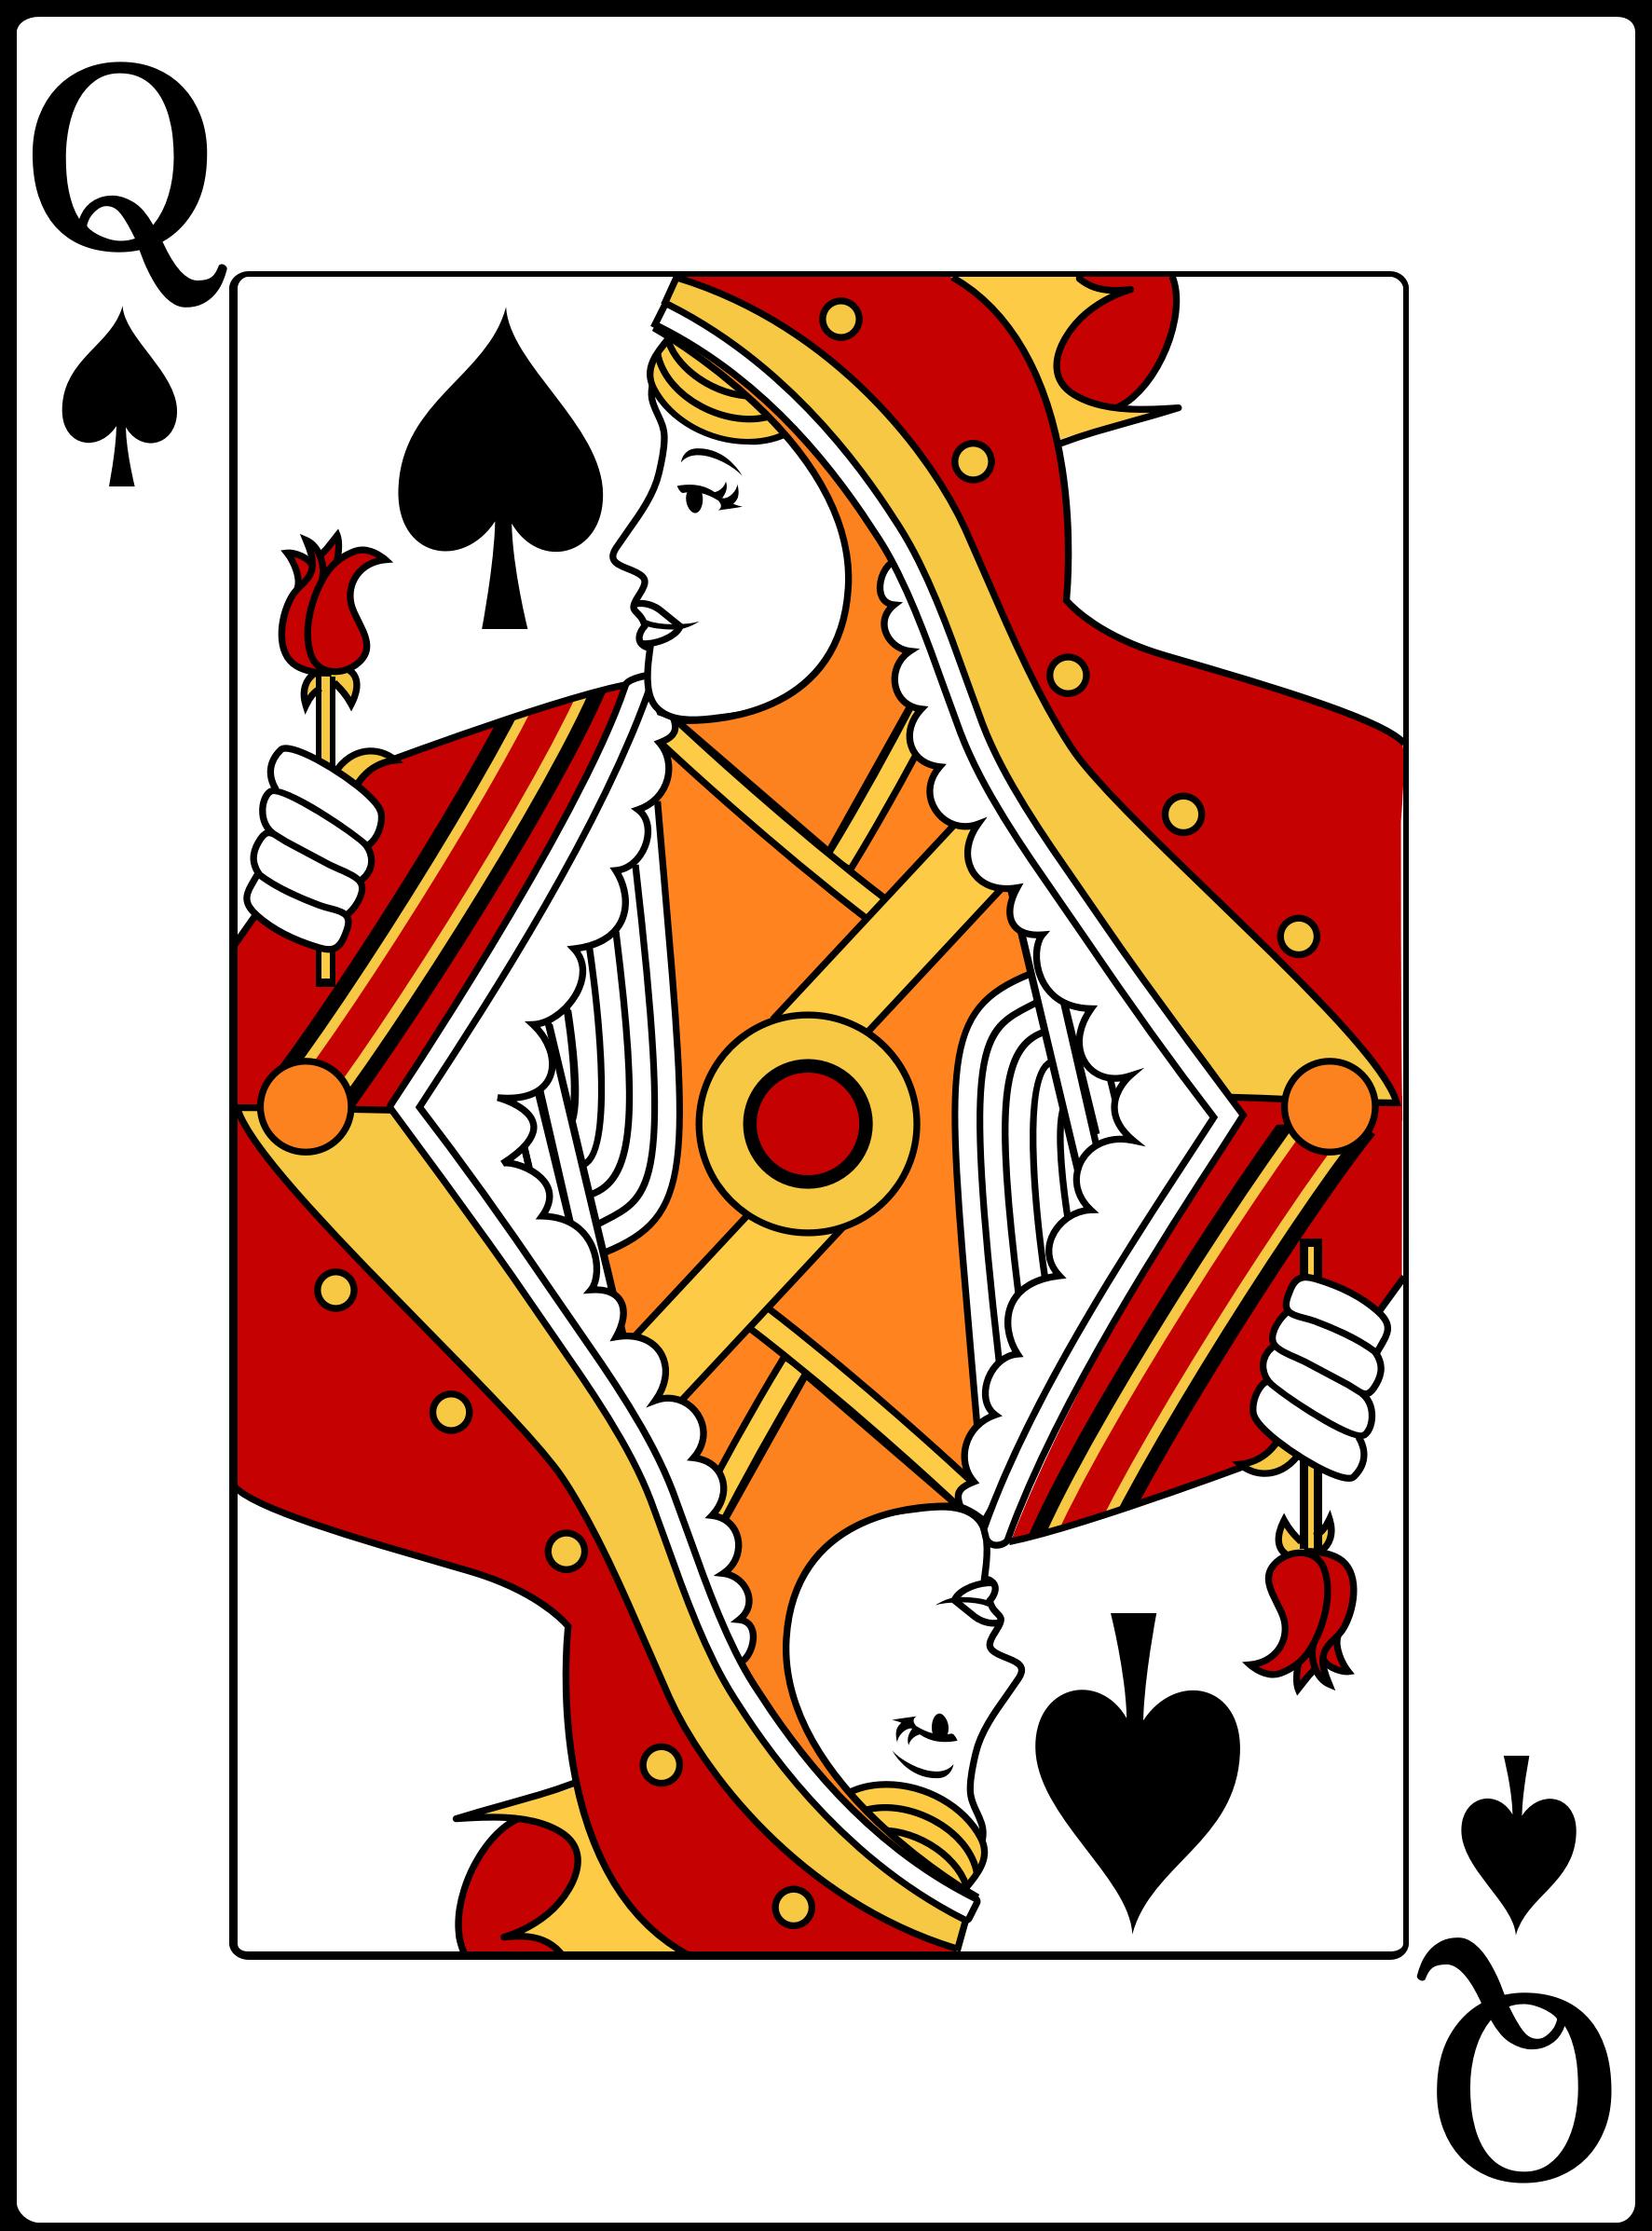 Queen clipart spades #8